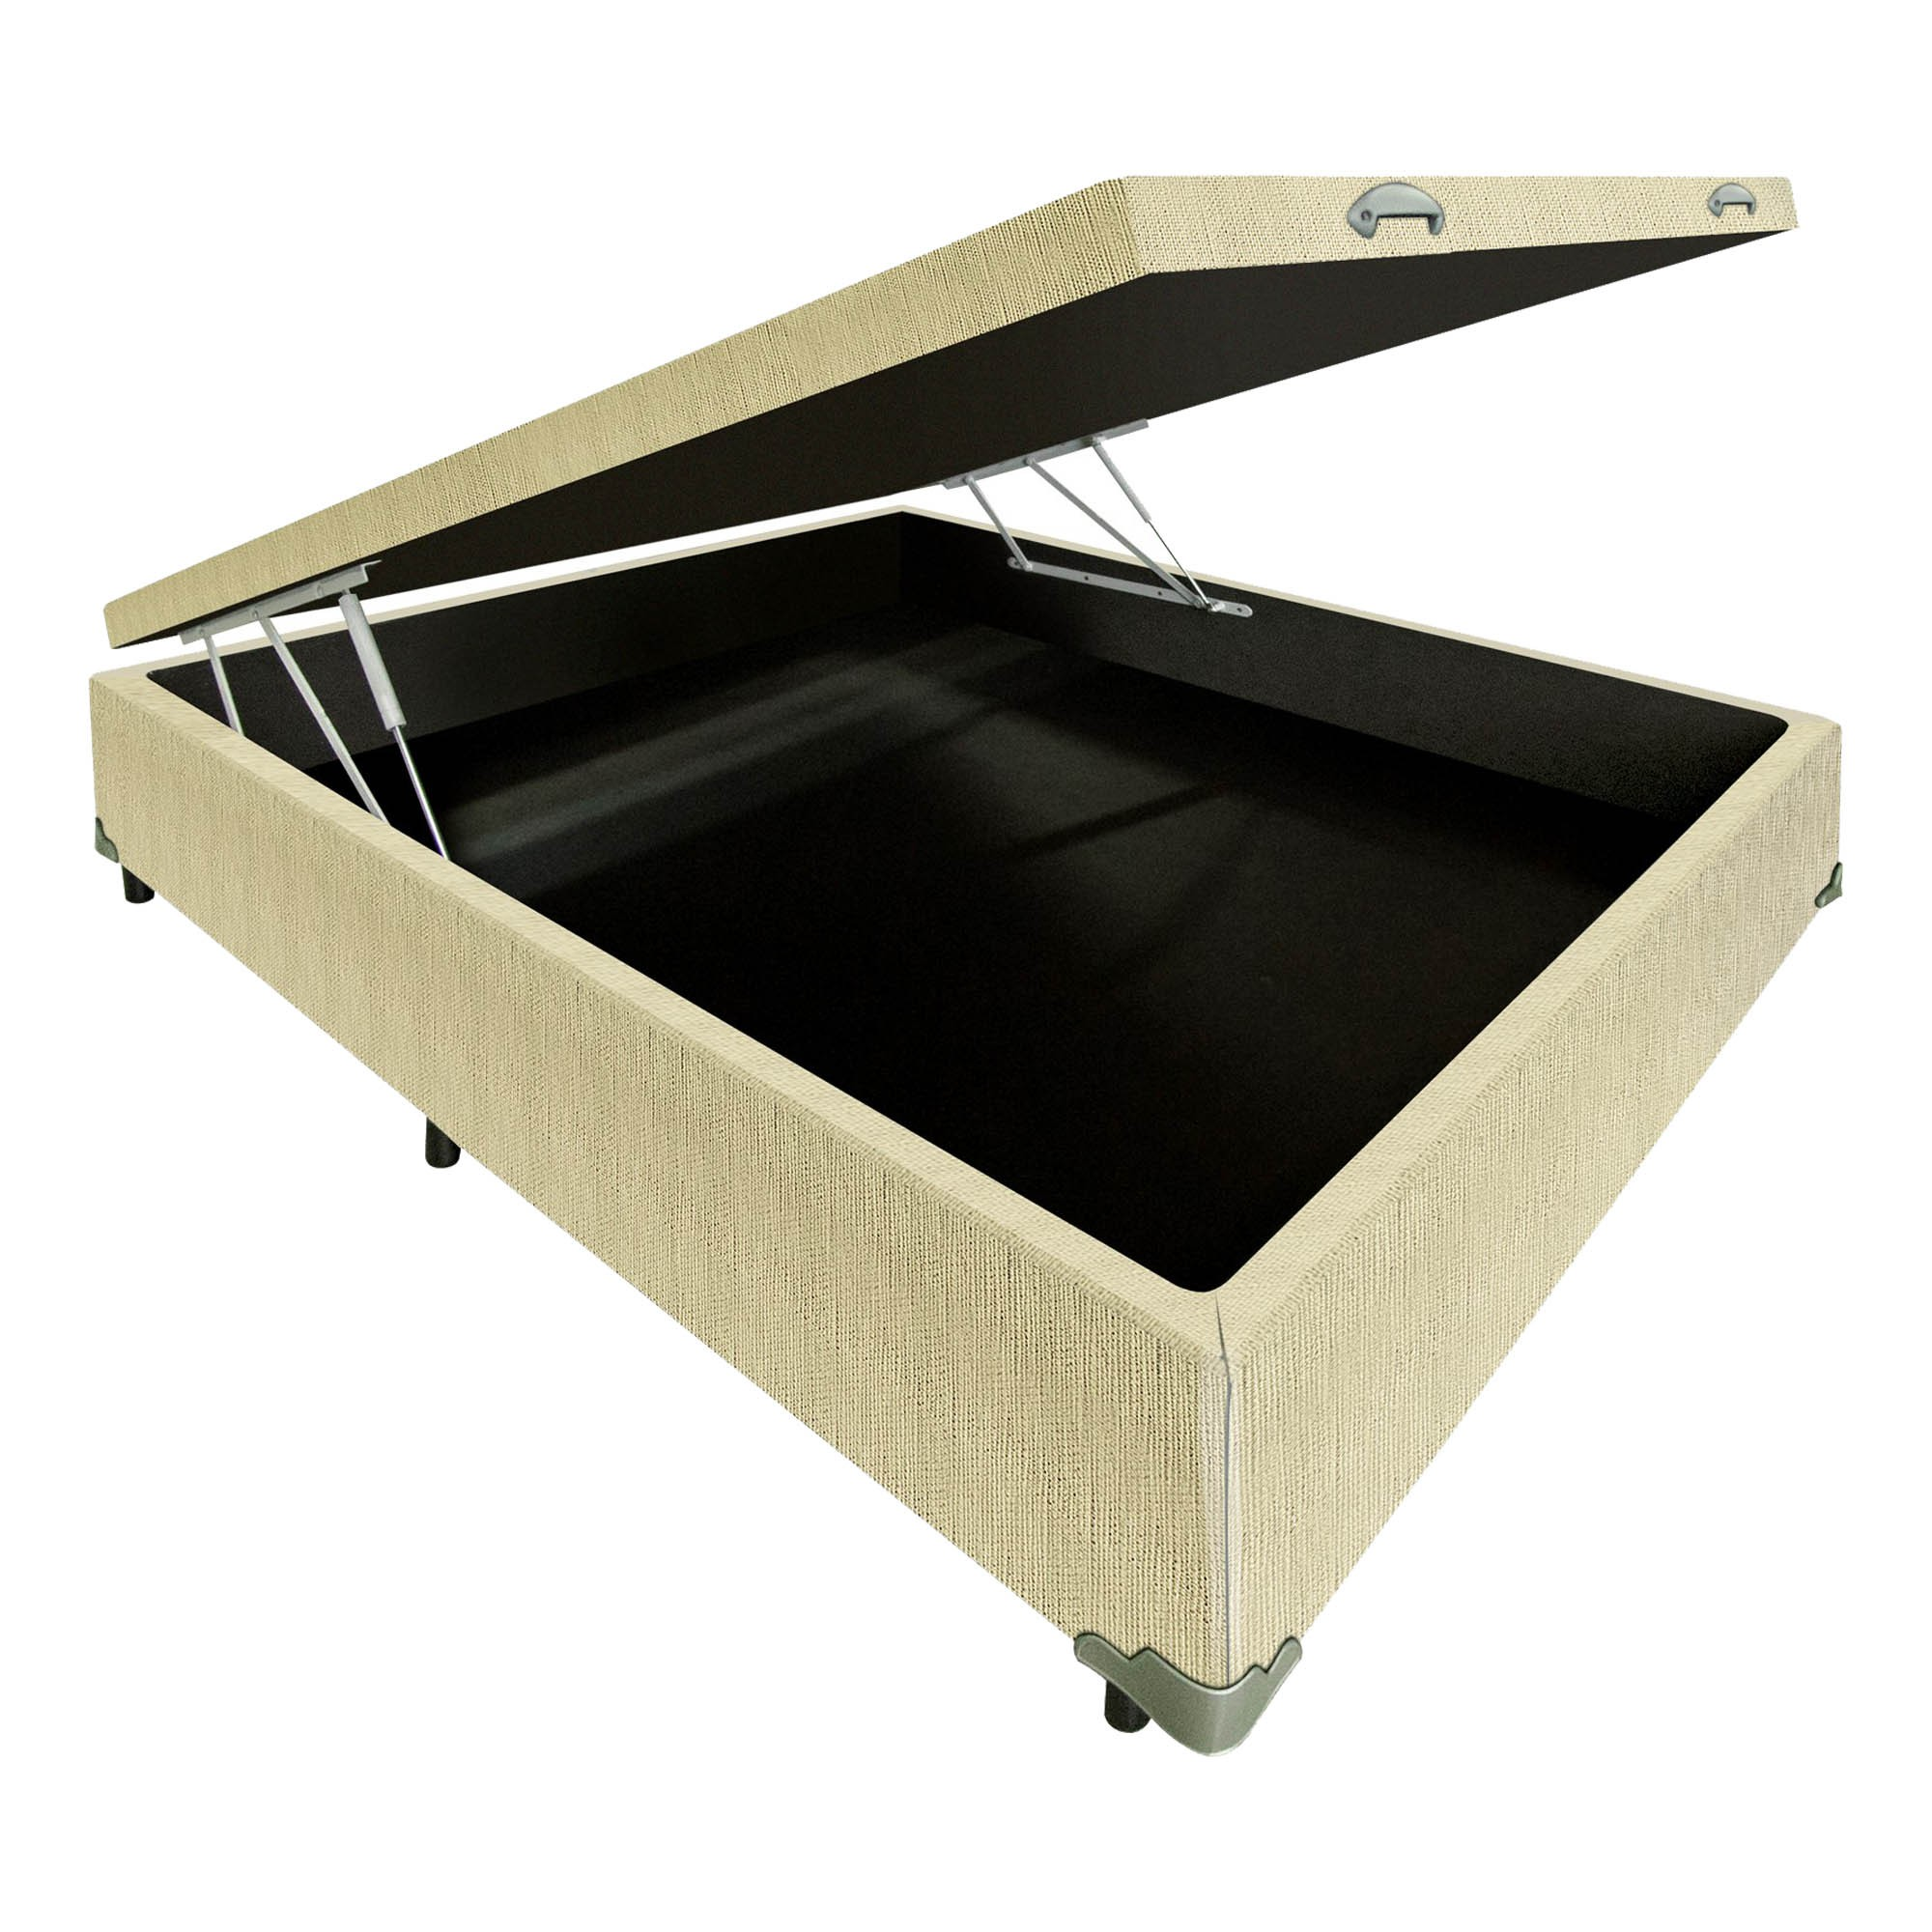 Box Baú Linhão Palha [Viúva 128 x 188 cm]